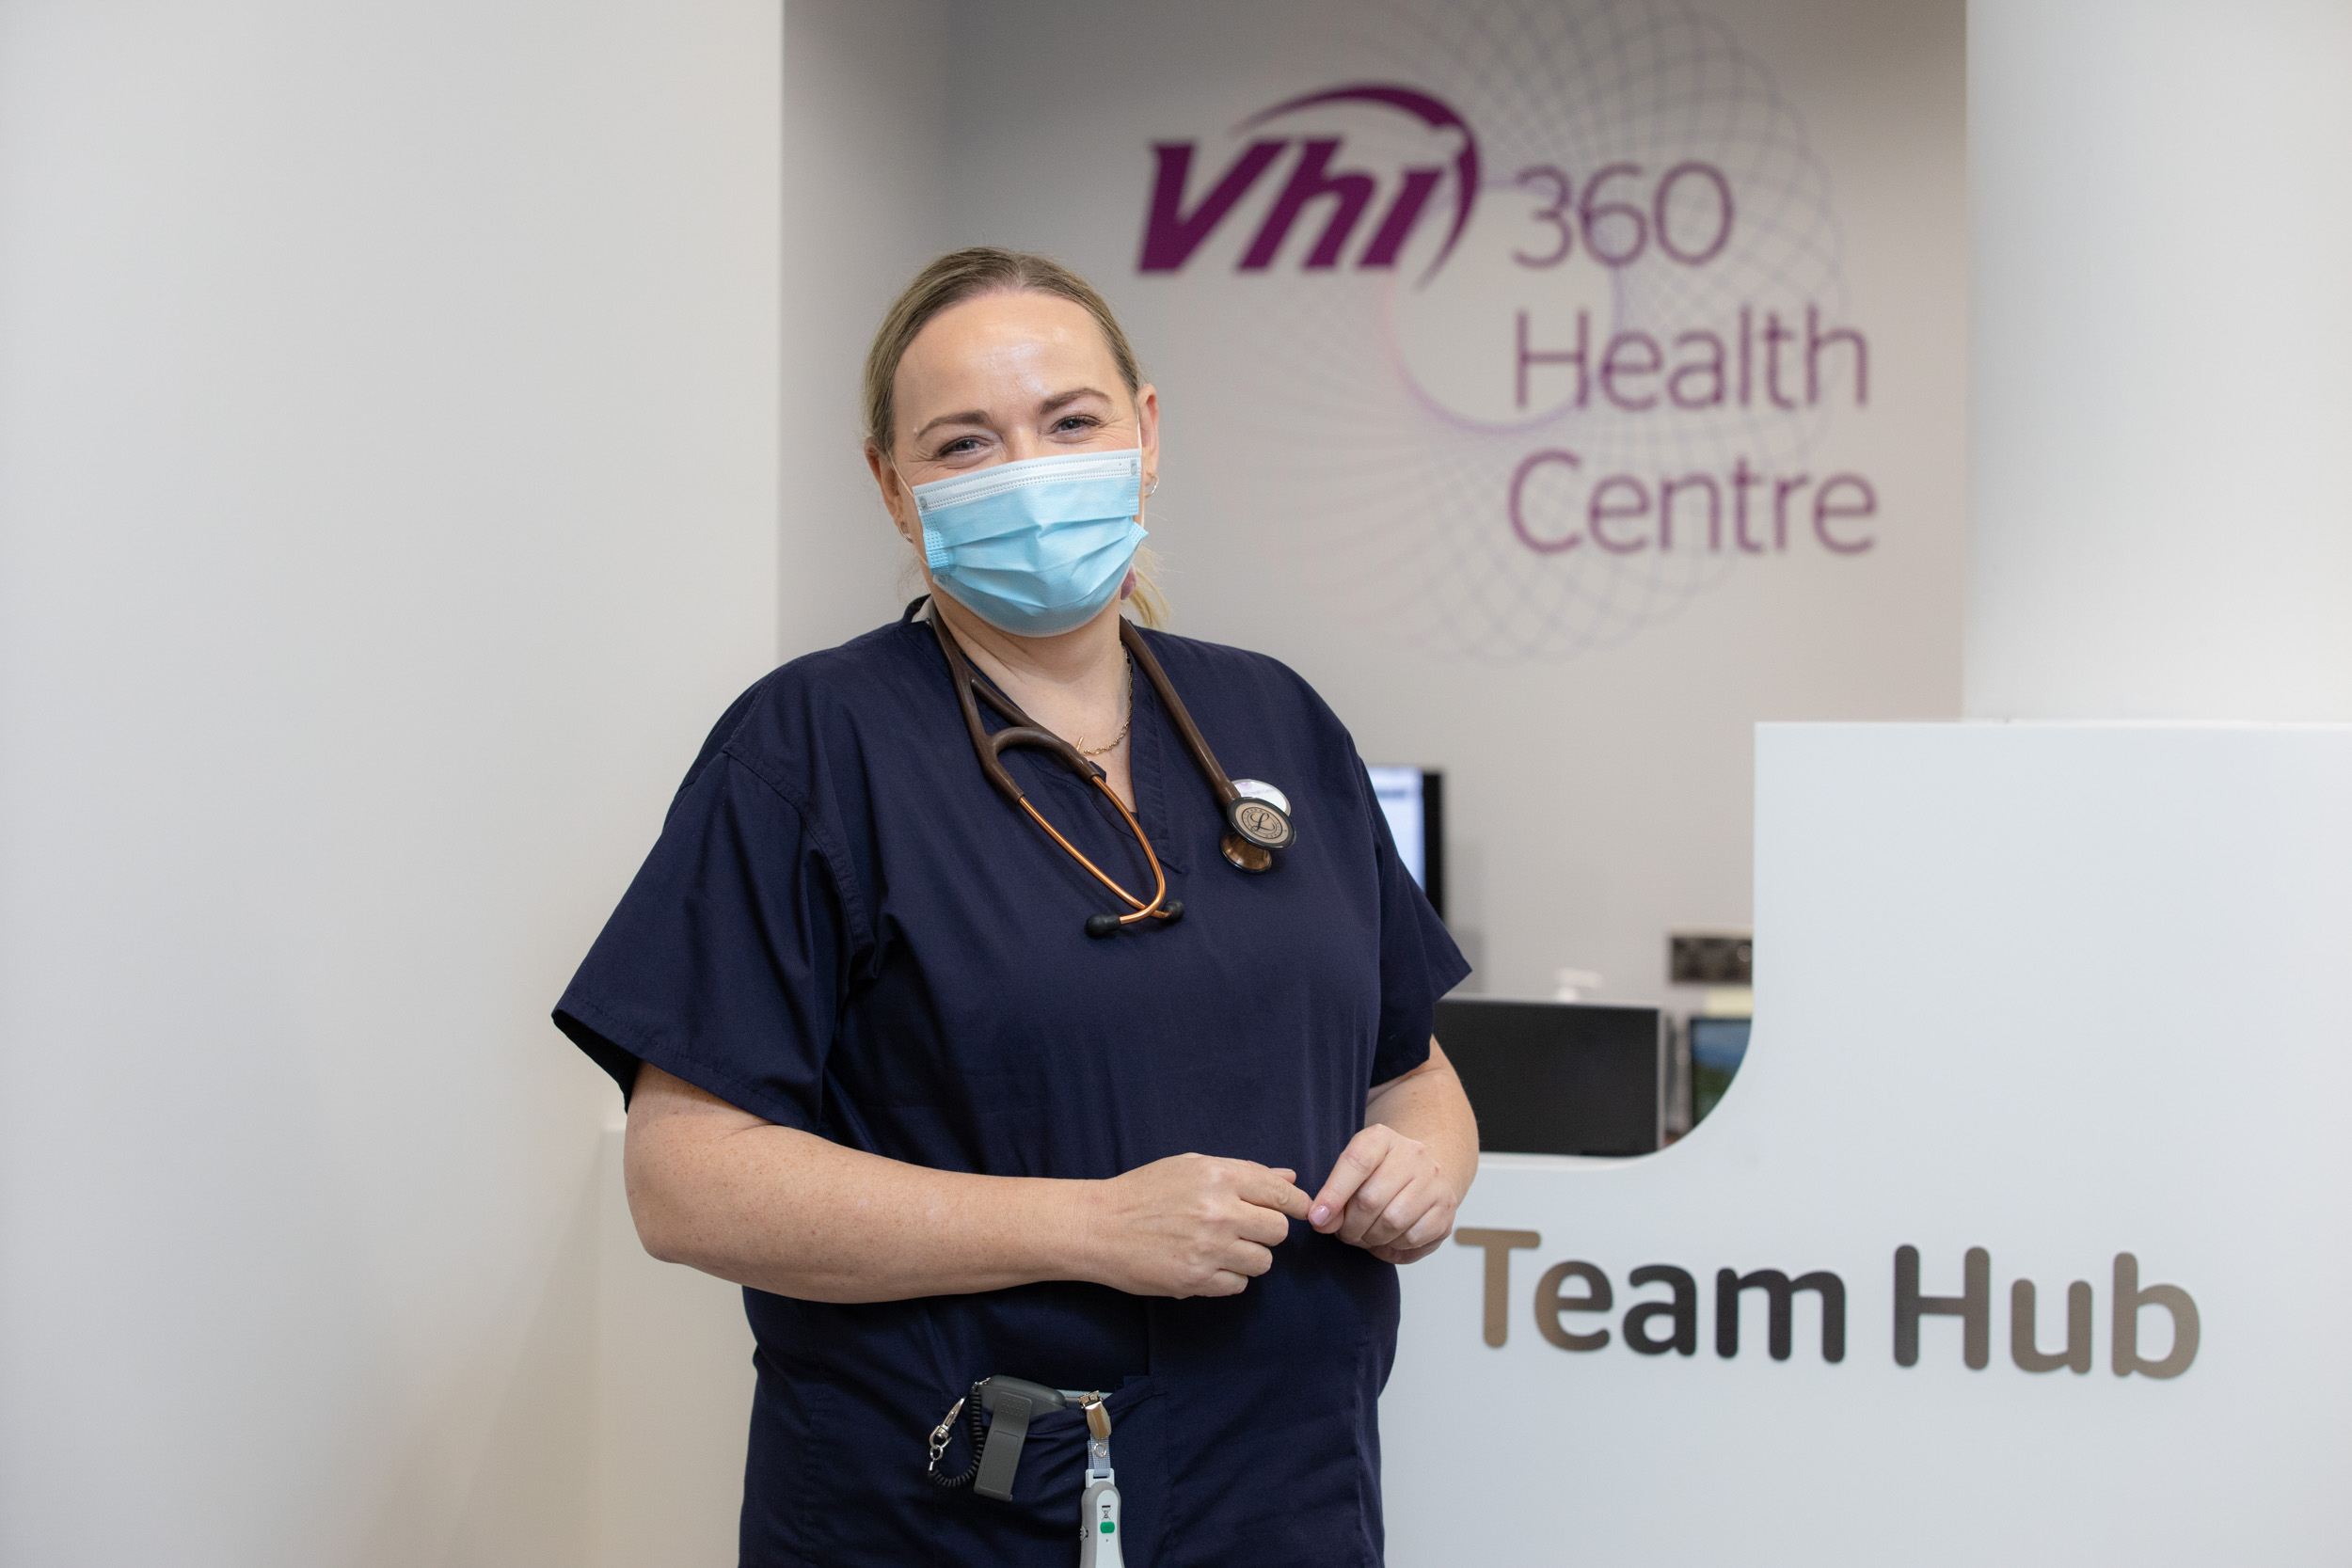 Vhi 360 Health Centre Limerick